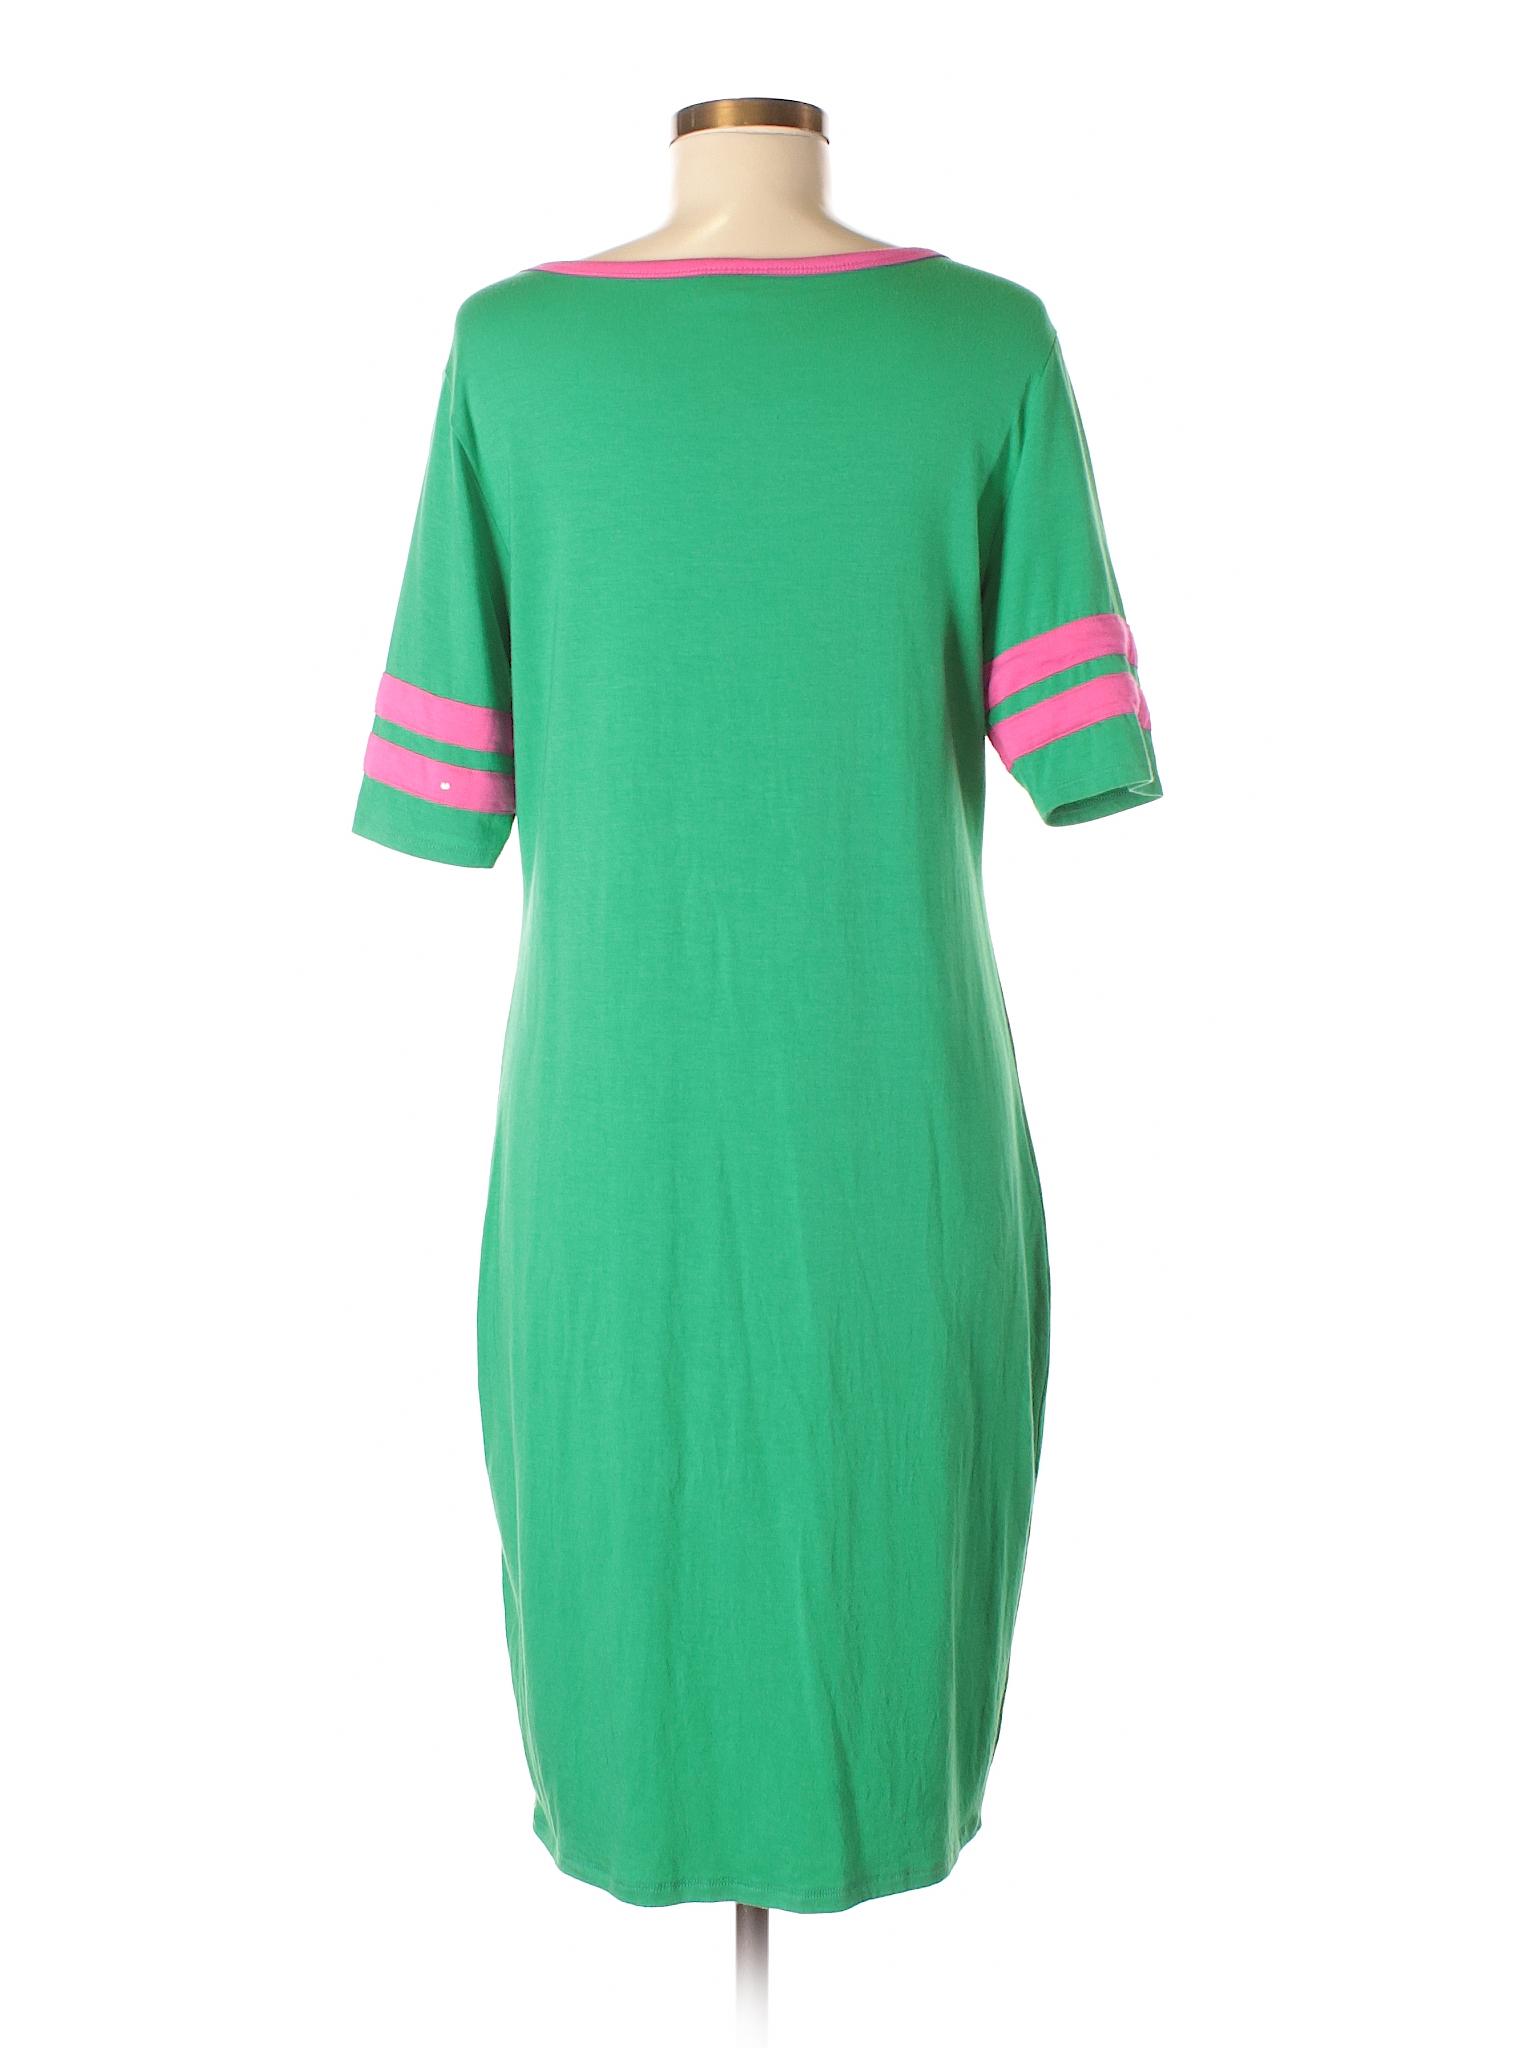 Casual Dress Lularoe Selling Lularoe Casual Selling wIg7qxf